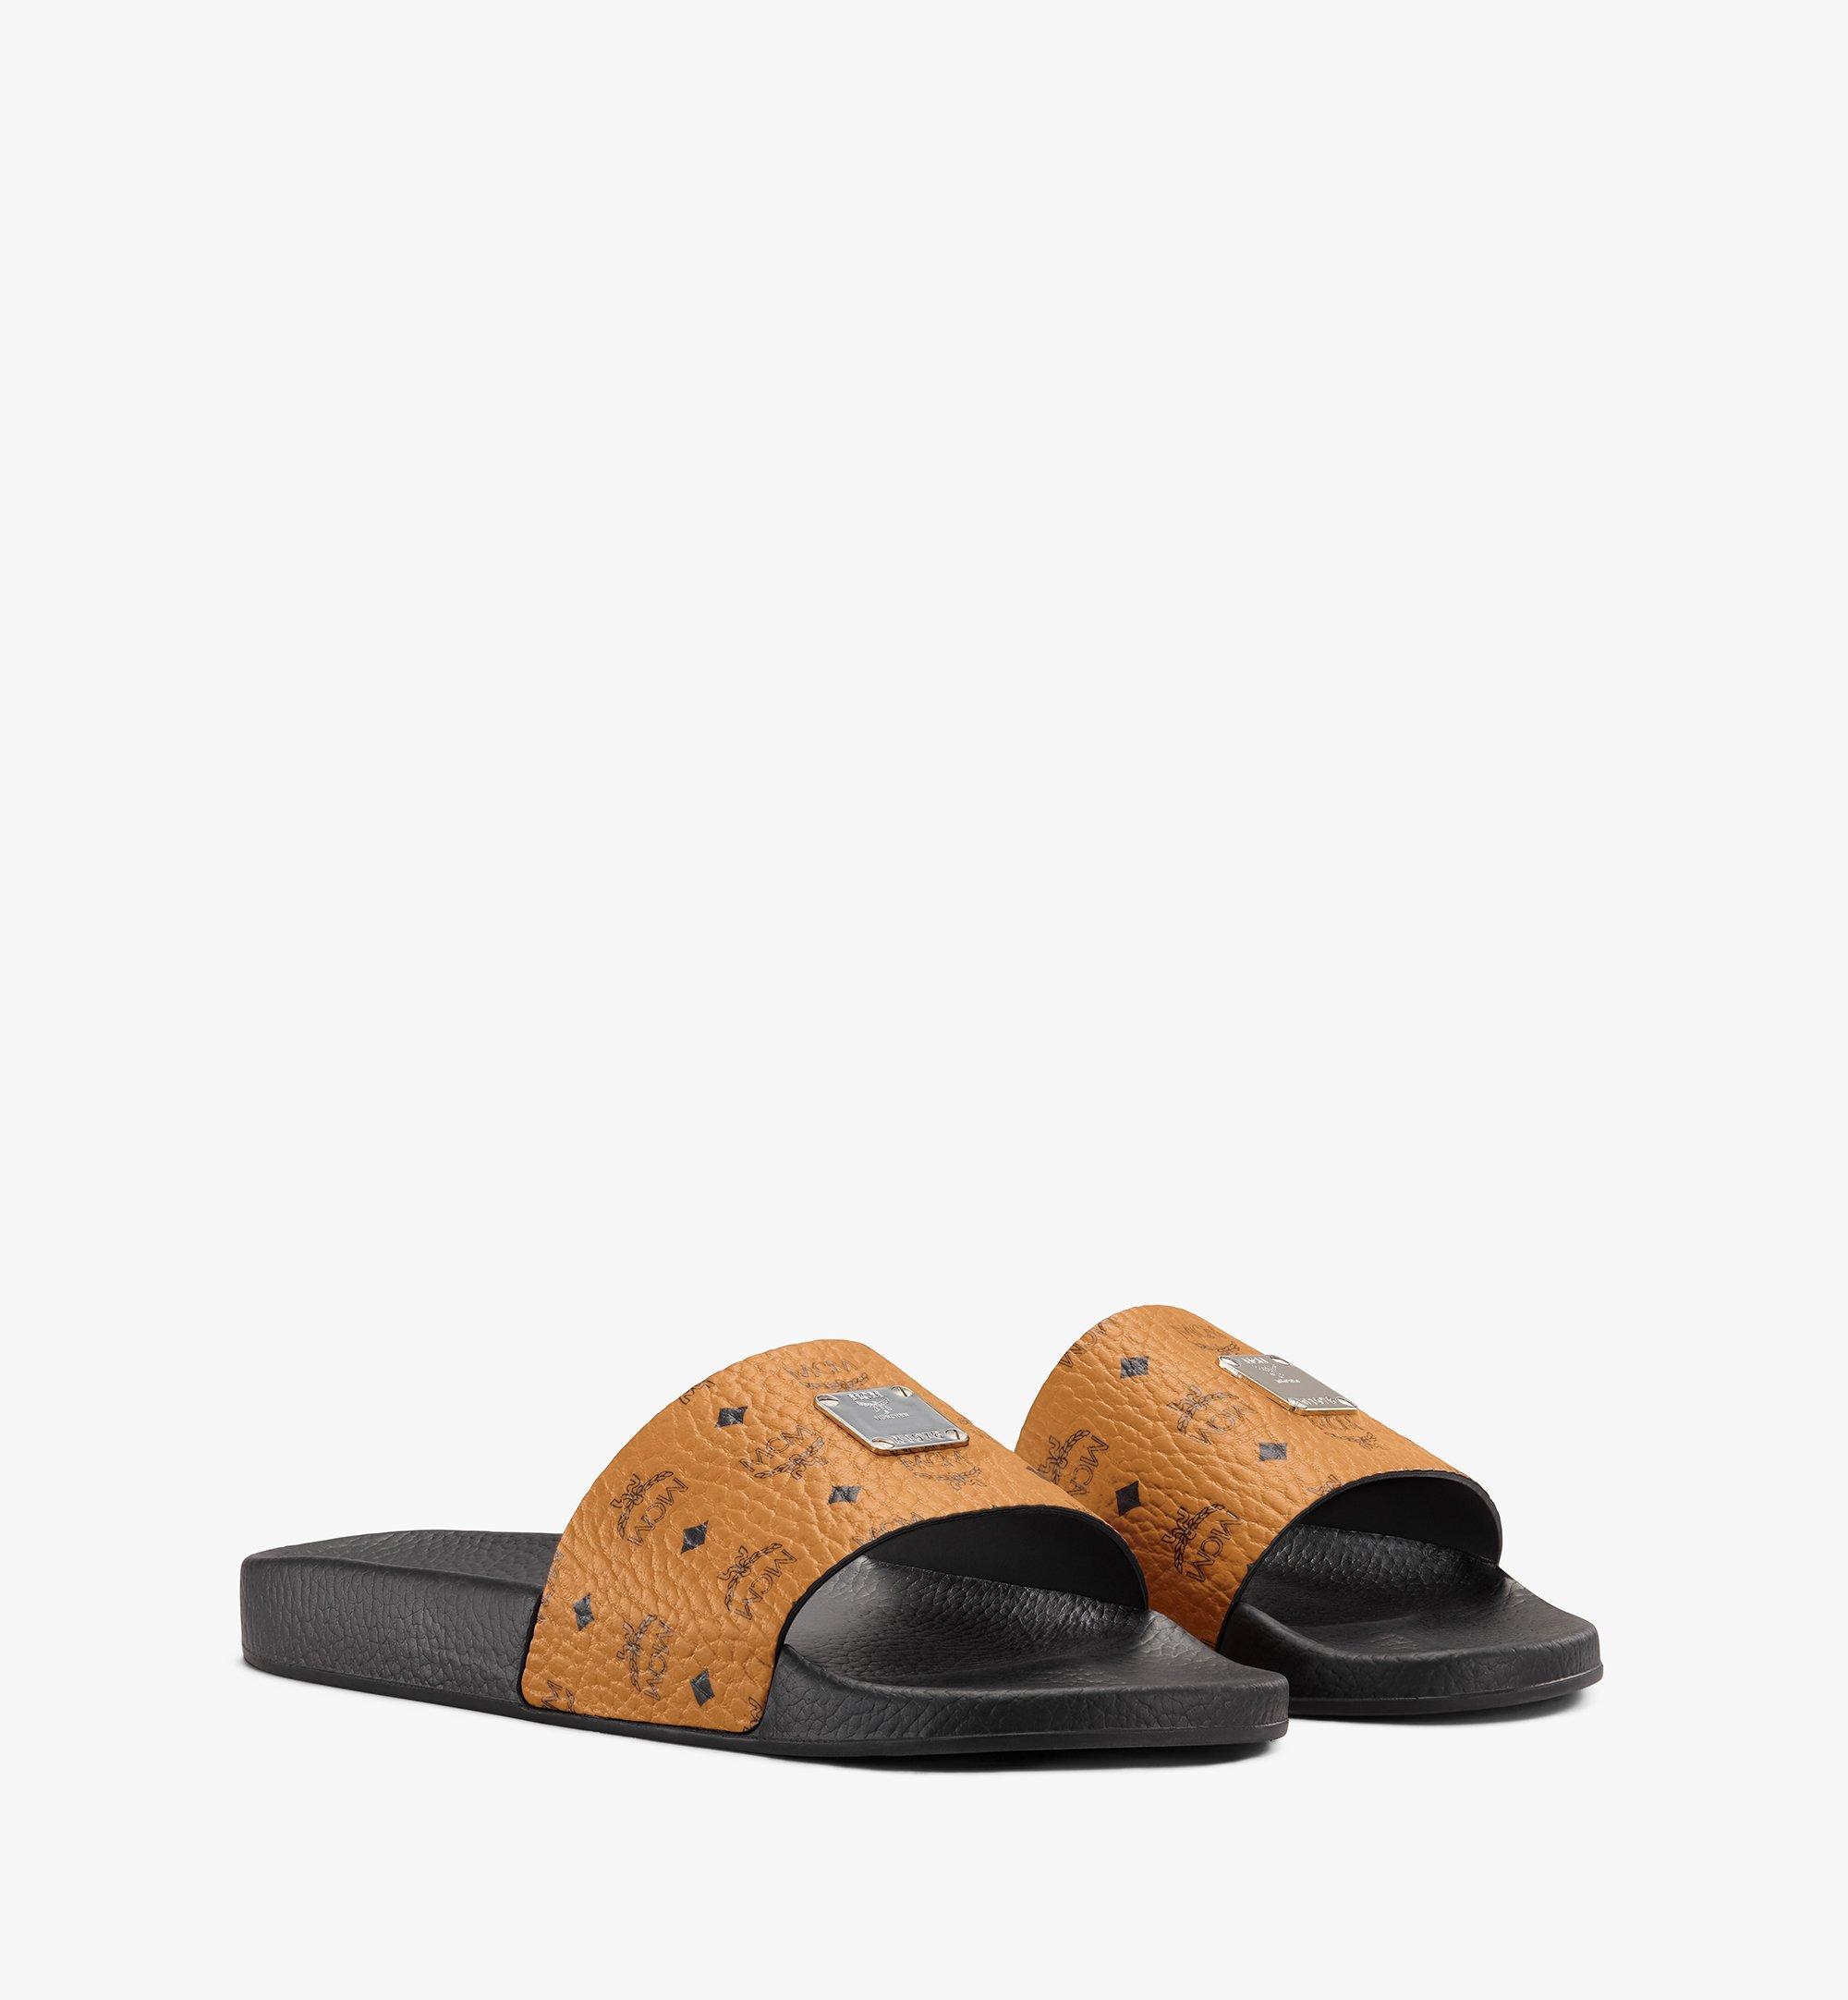 MCM Men's Visetos Slides  - Cognac - Size: 041